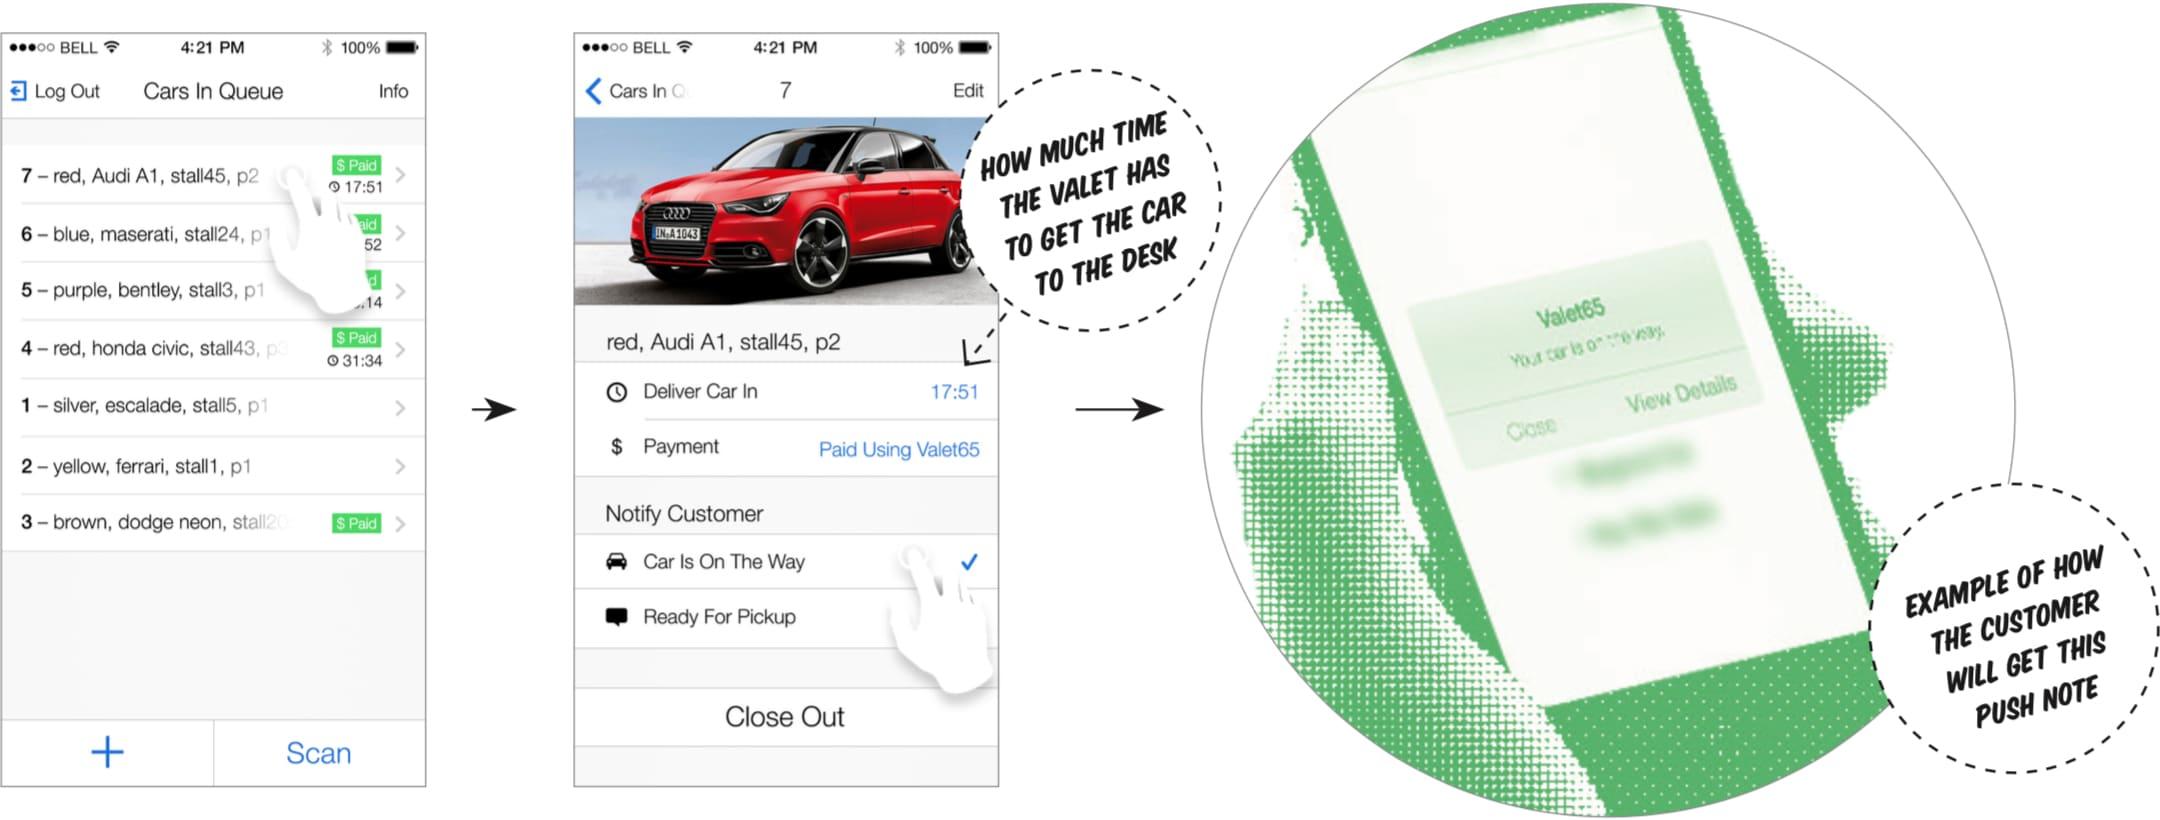 Wireframe of valet notifying customer